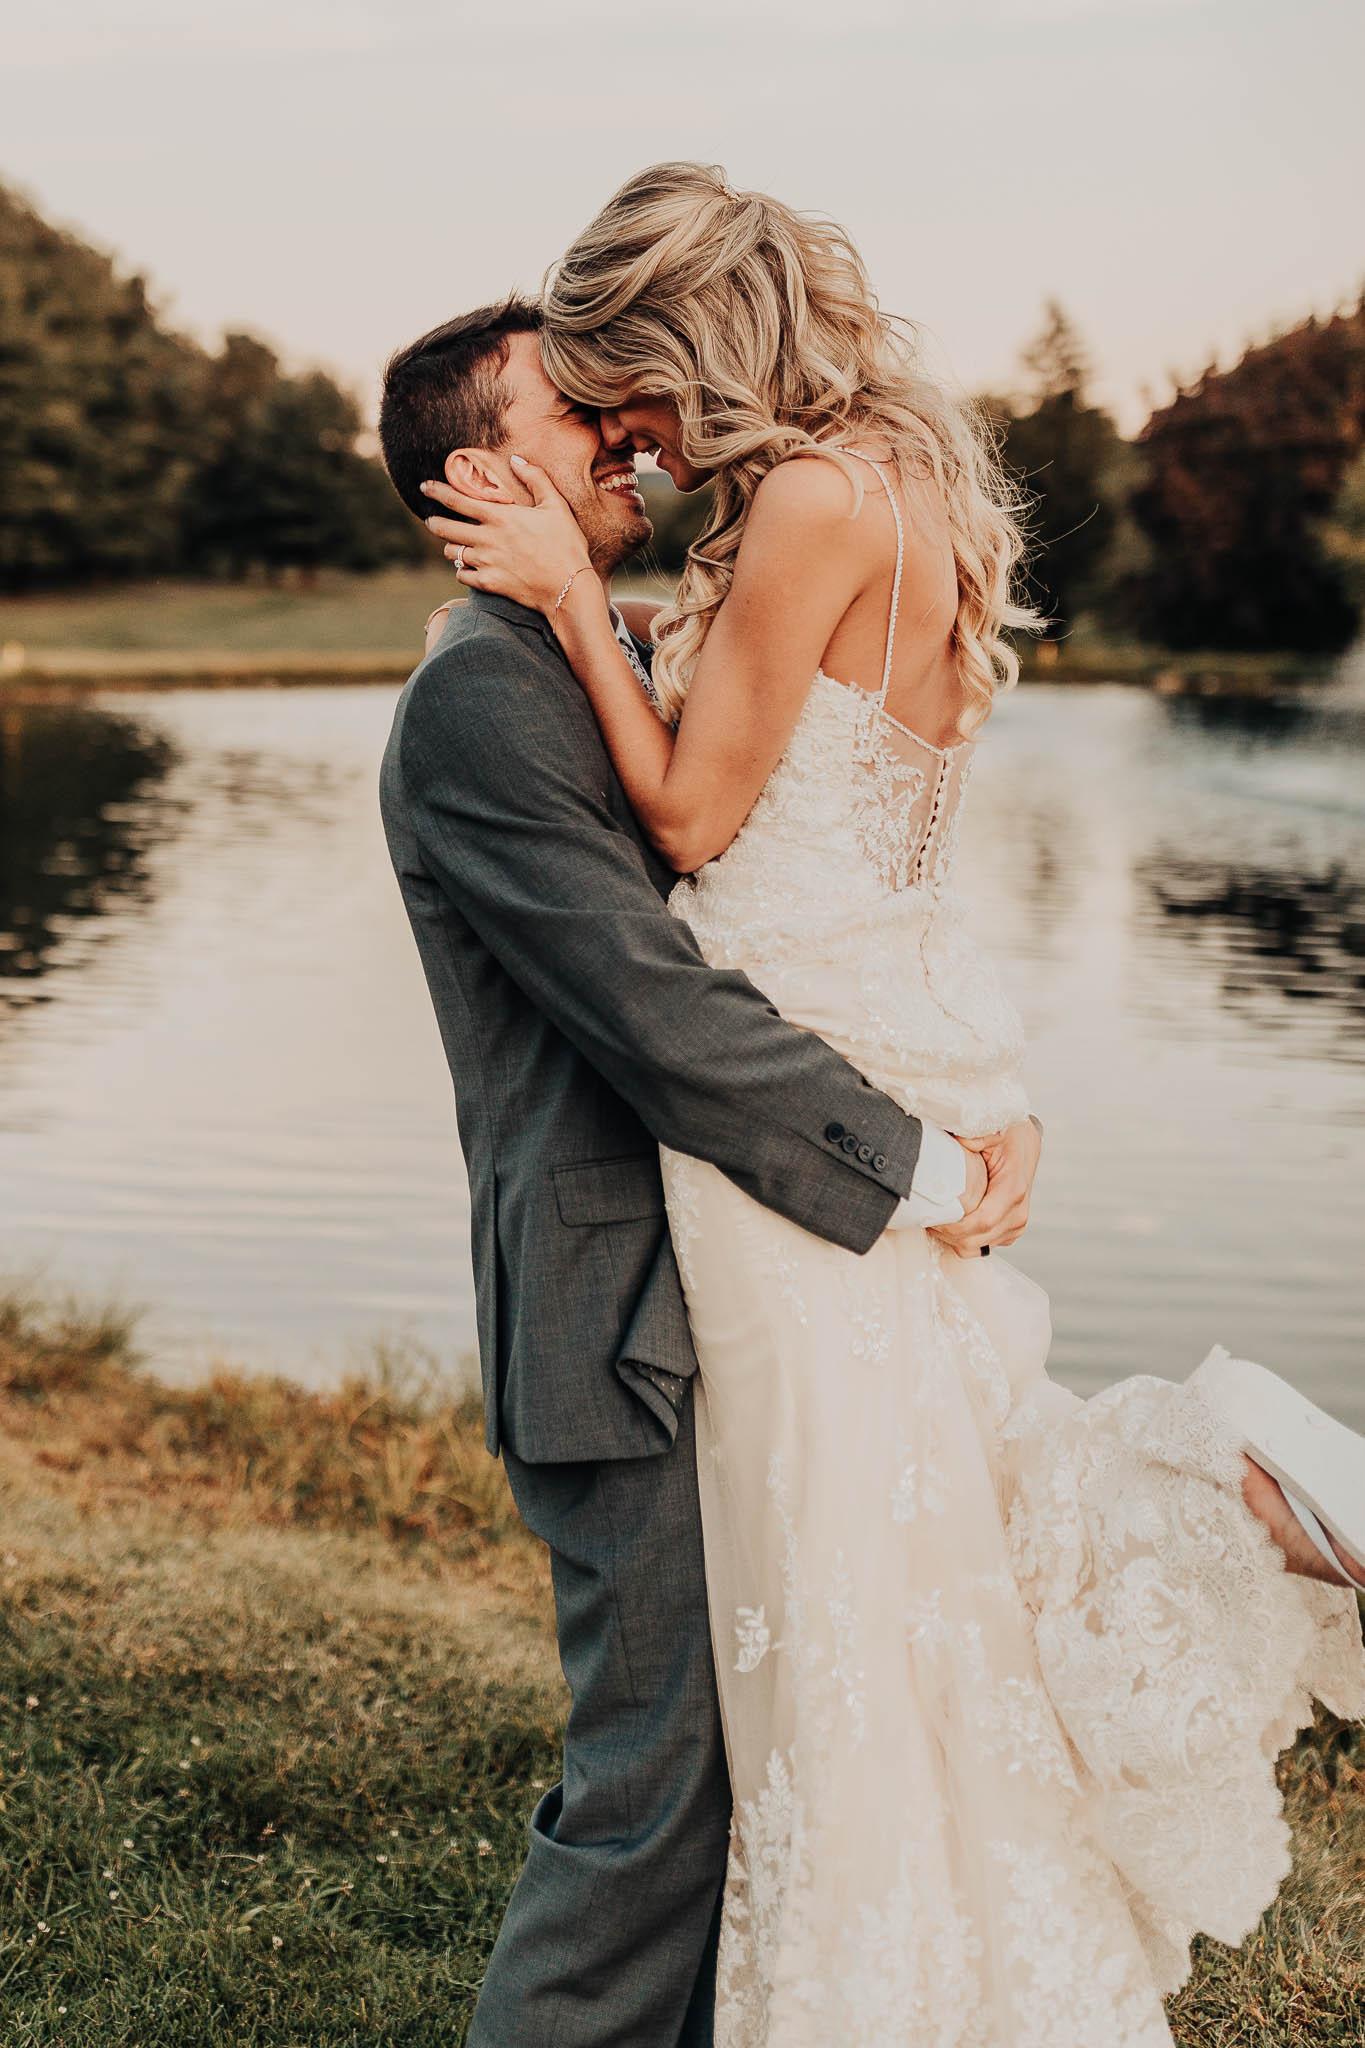 Frosty-Valley-September-Wedding-8274.jpg